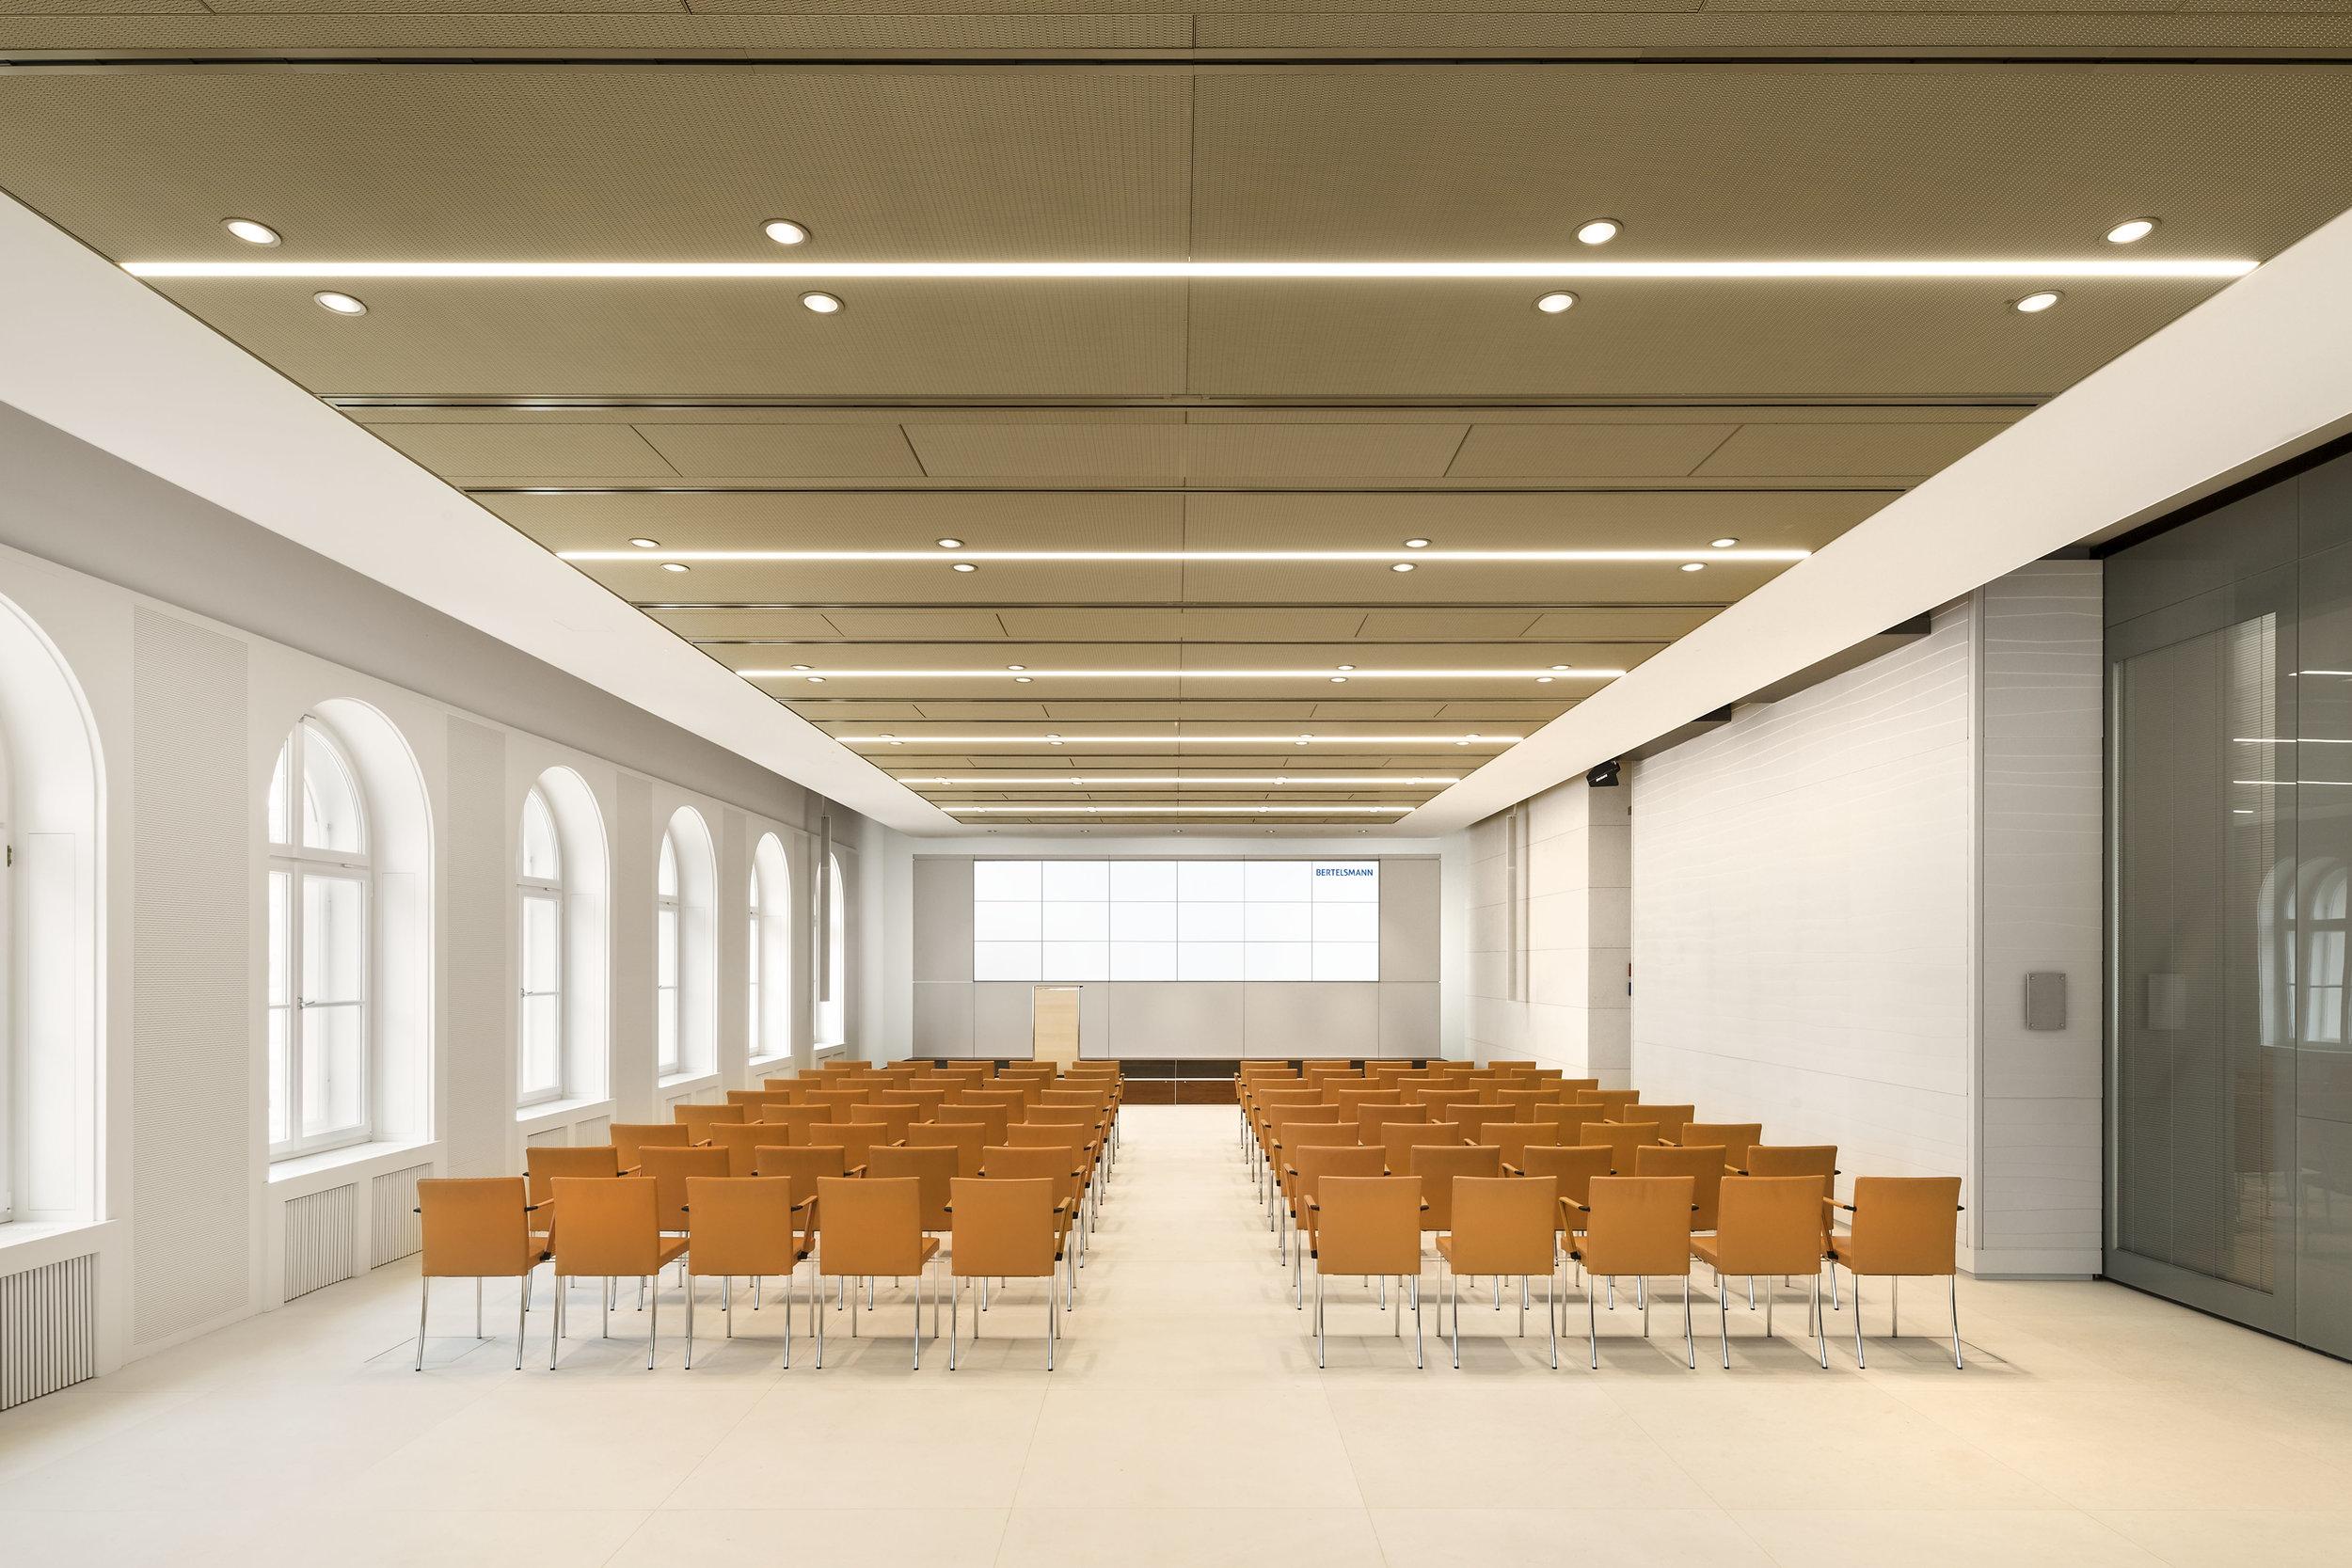 bertelsmann-berlin_coorporate-interior-design_coordination-berlin_05.jpg